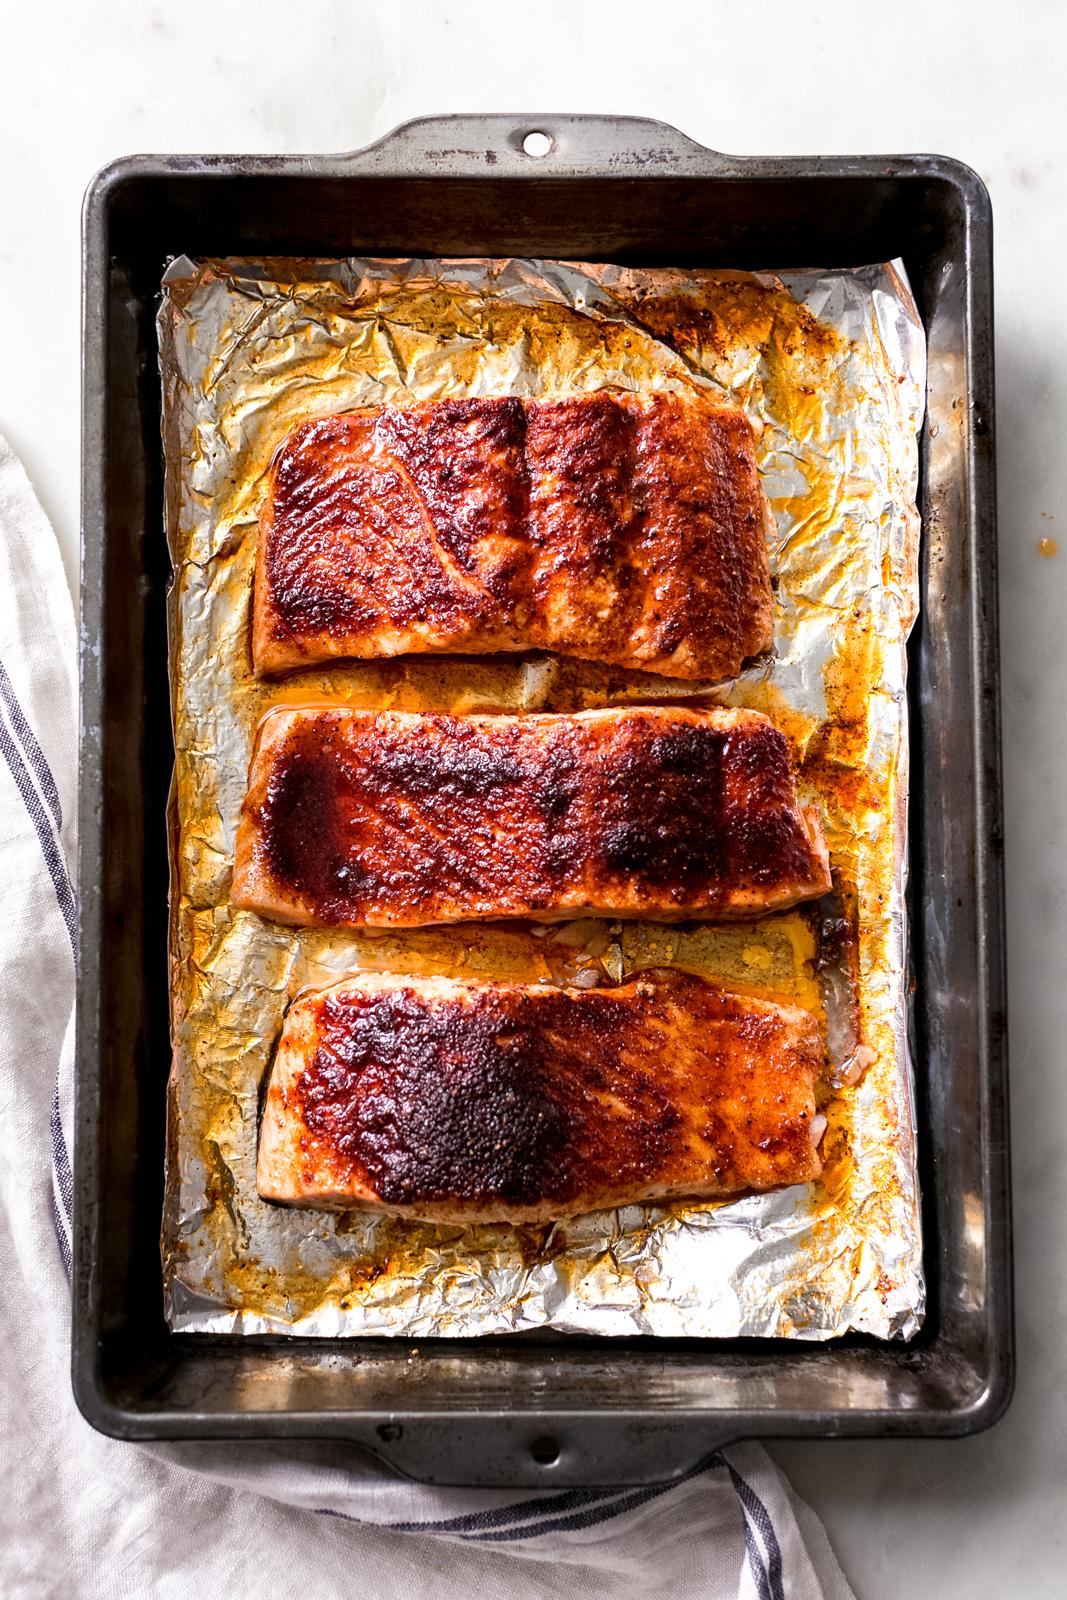 maple glazed salmon portions on foil in baking pan